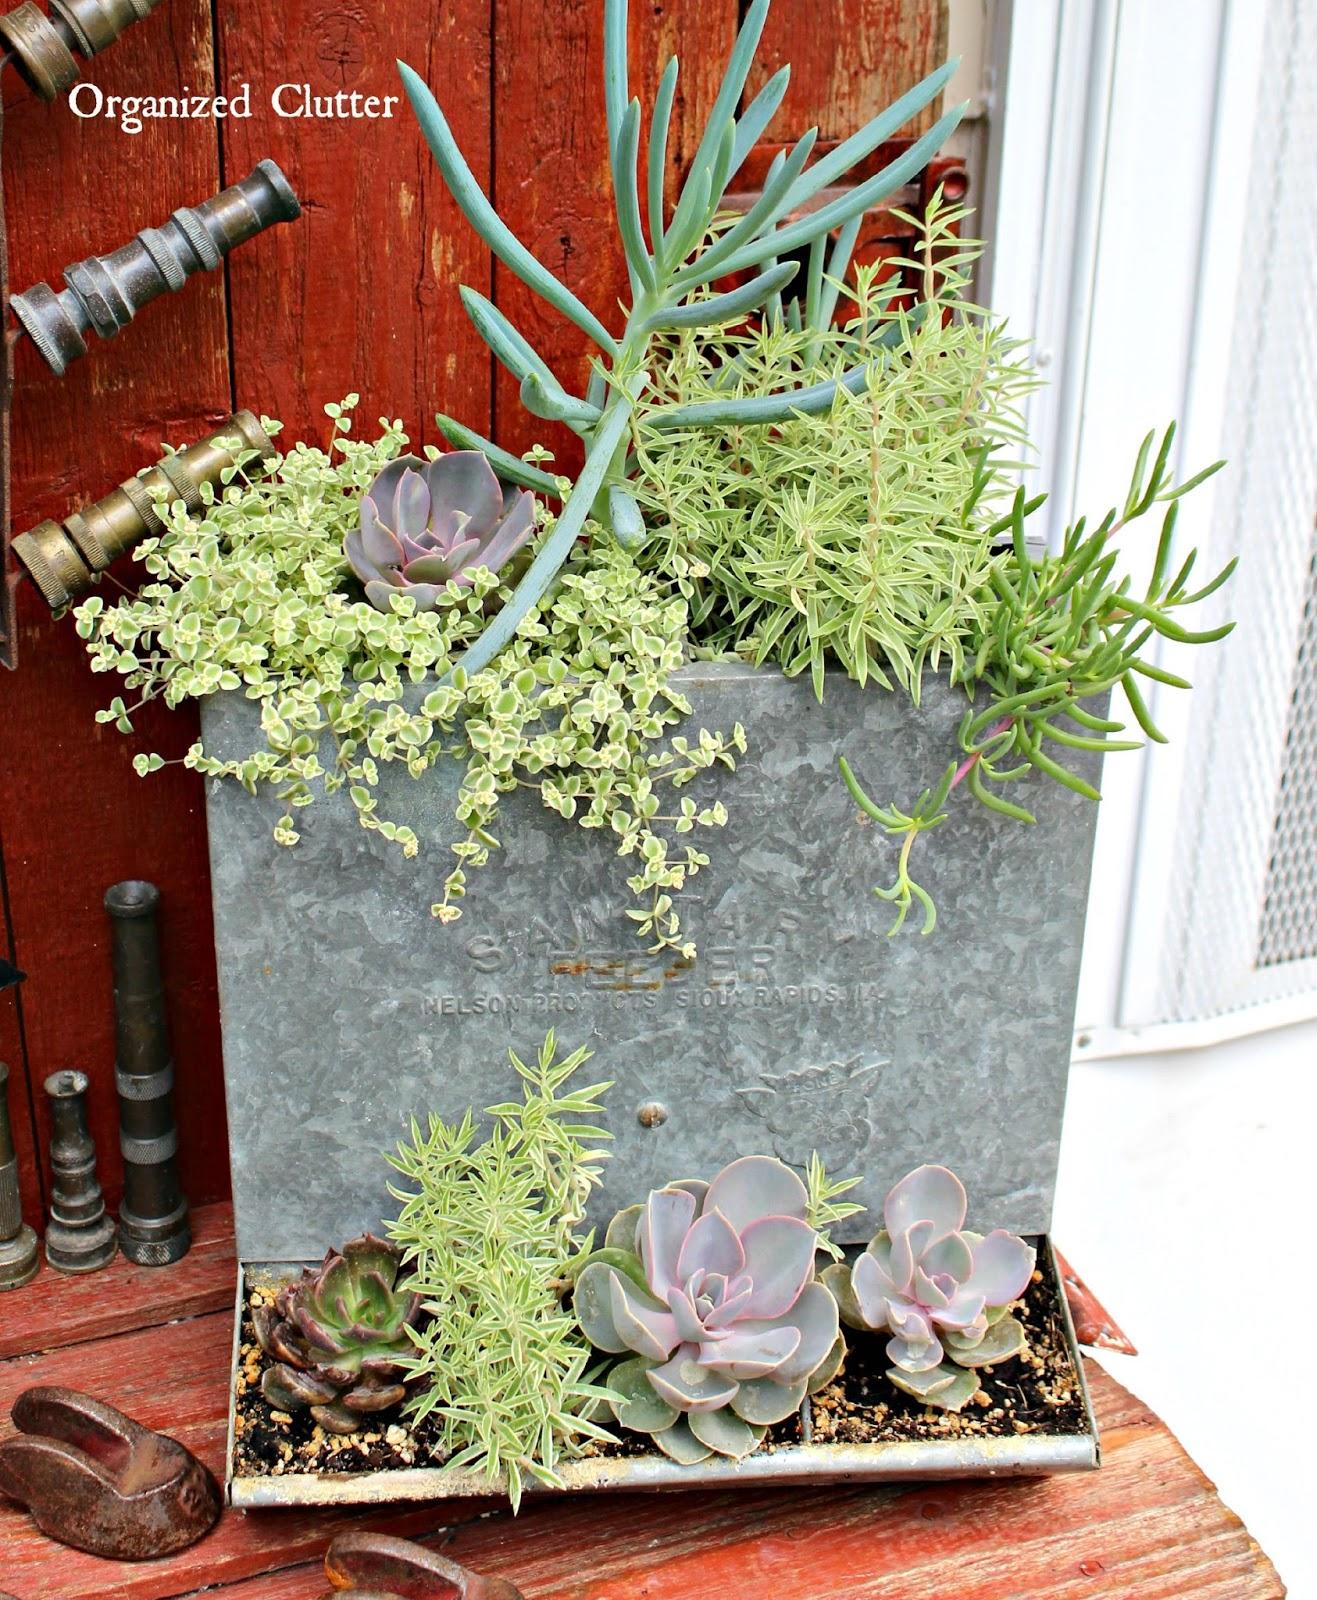 Outdoors And Gardening: Dana's Fun Outdoor Junk Decor & Gardens